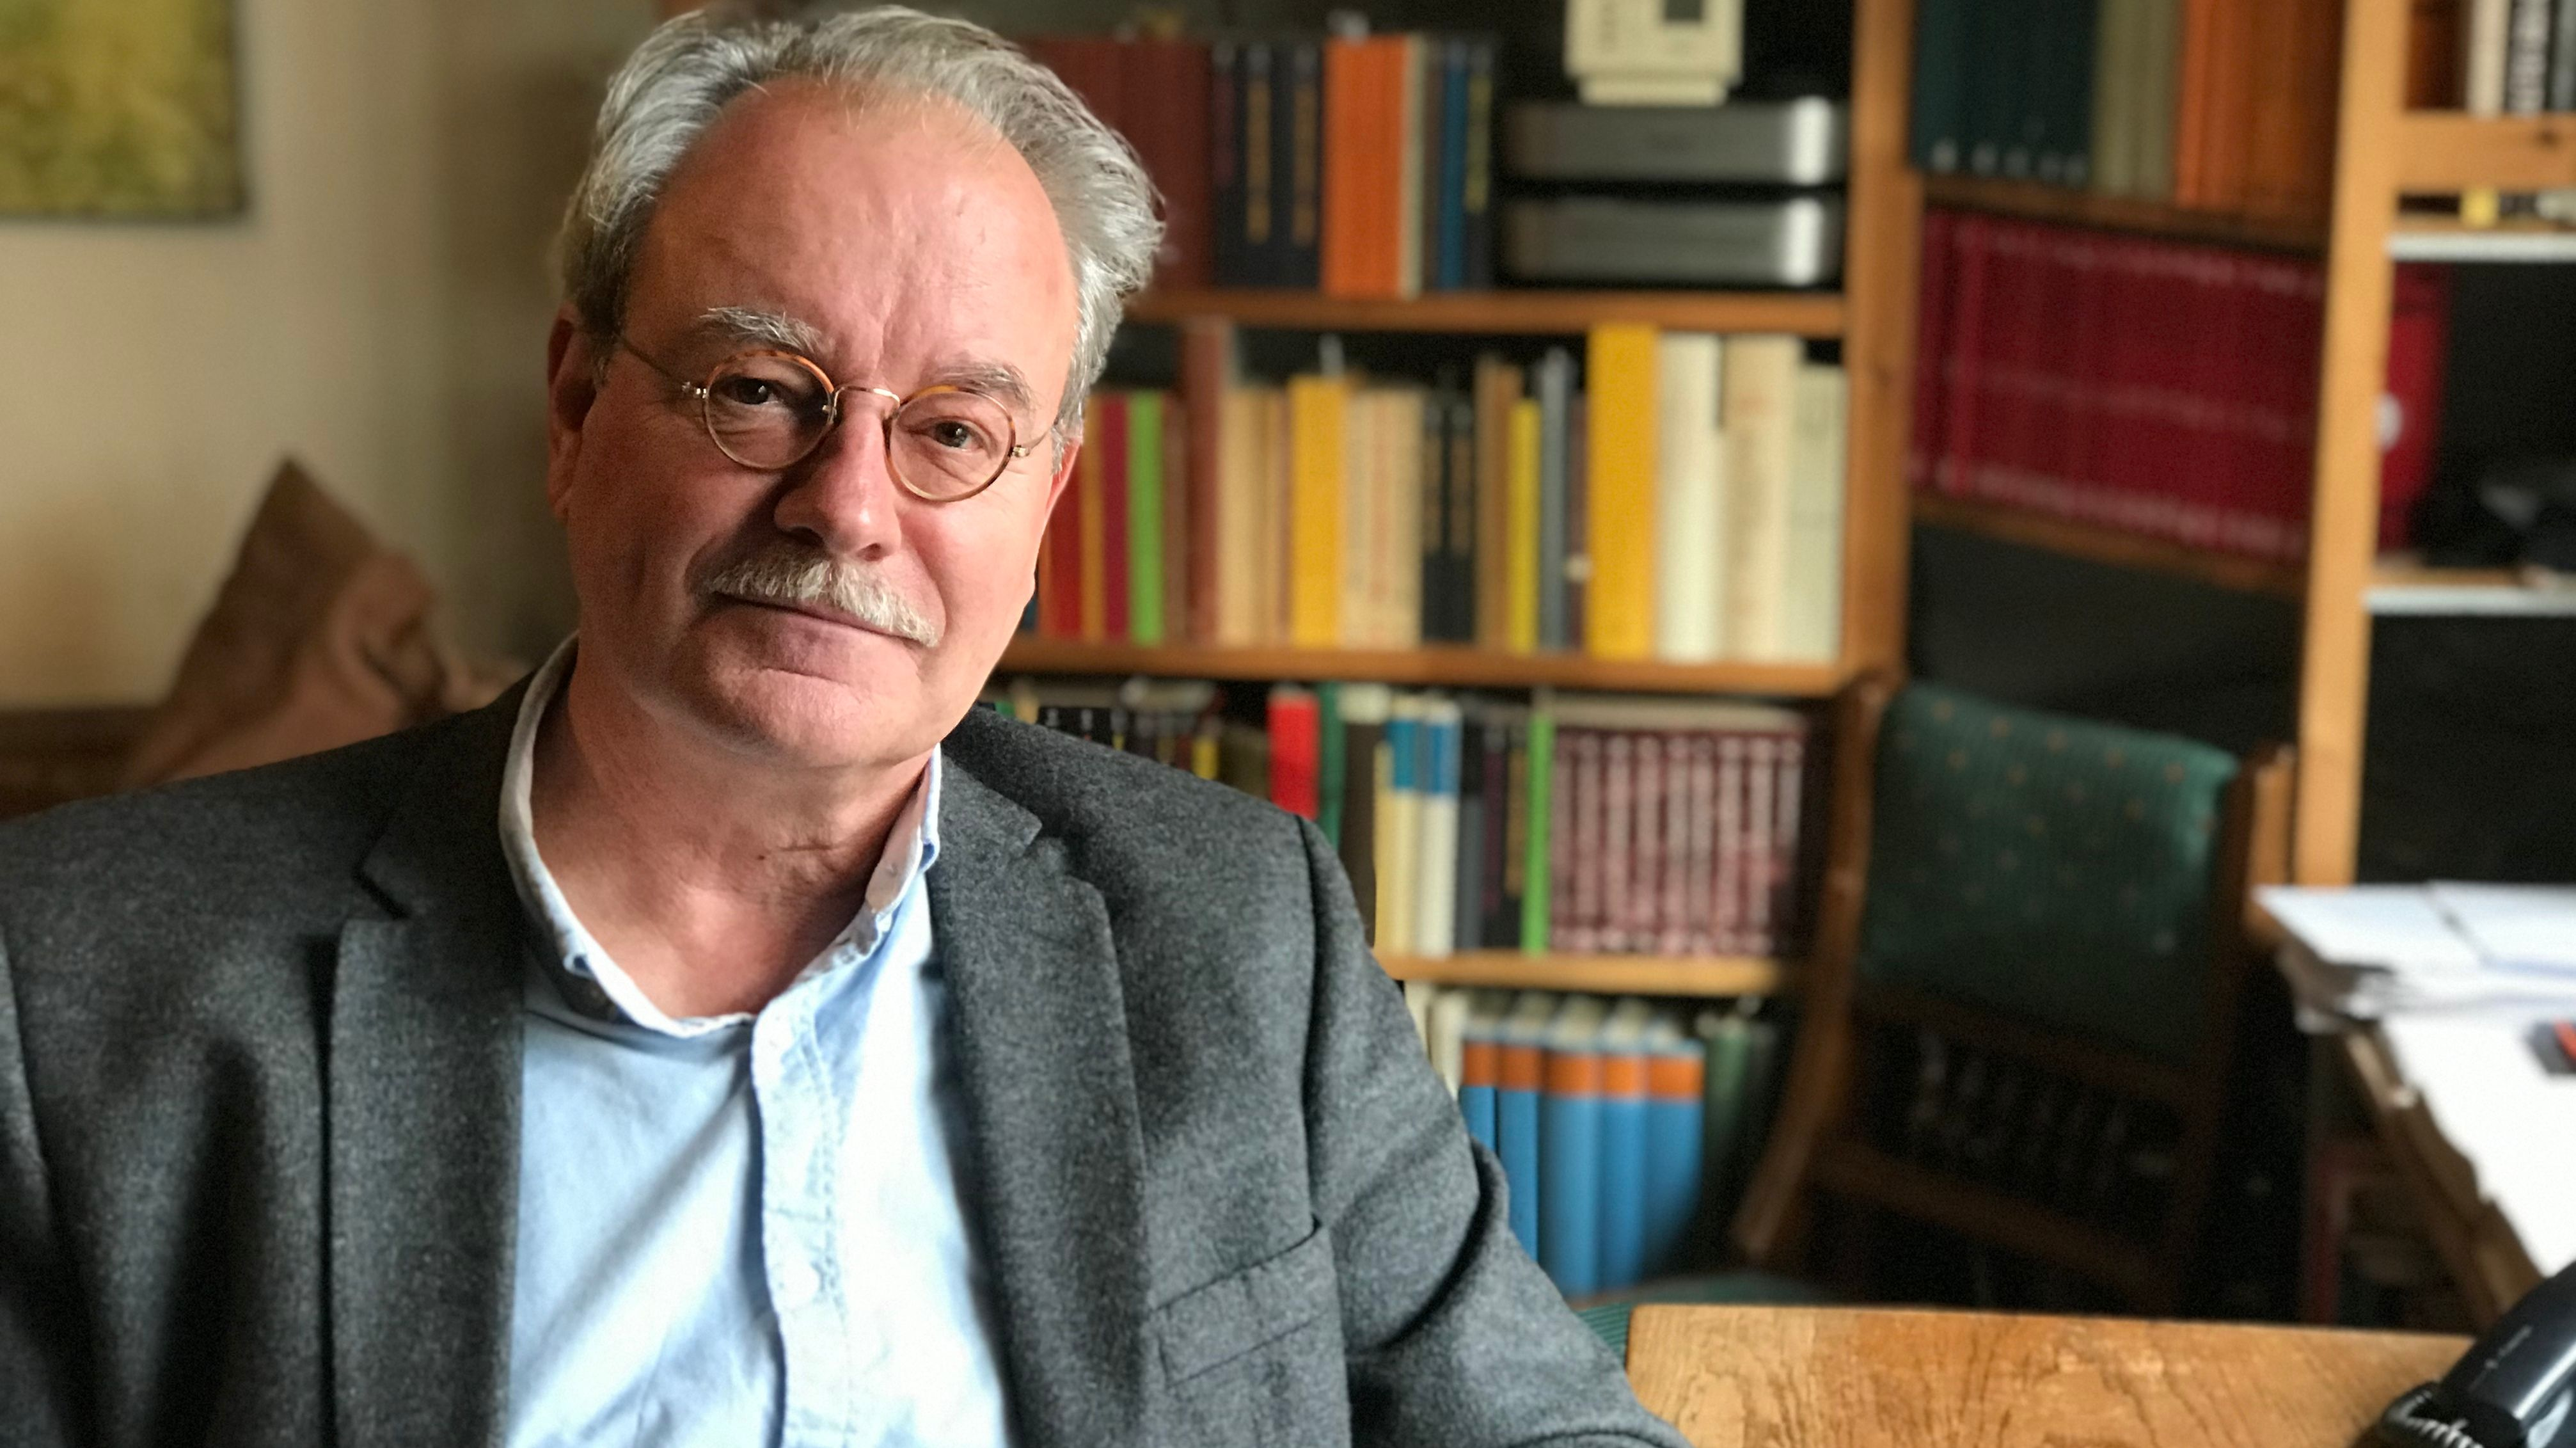 Übersetzter Andreas Nohl